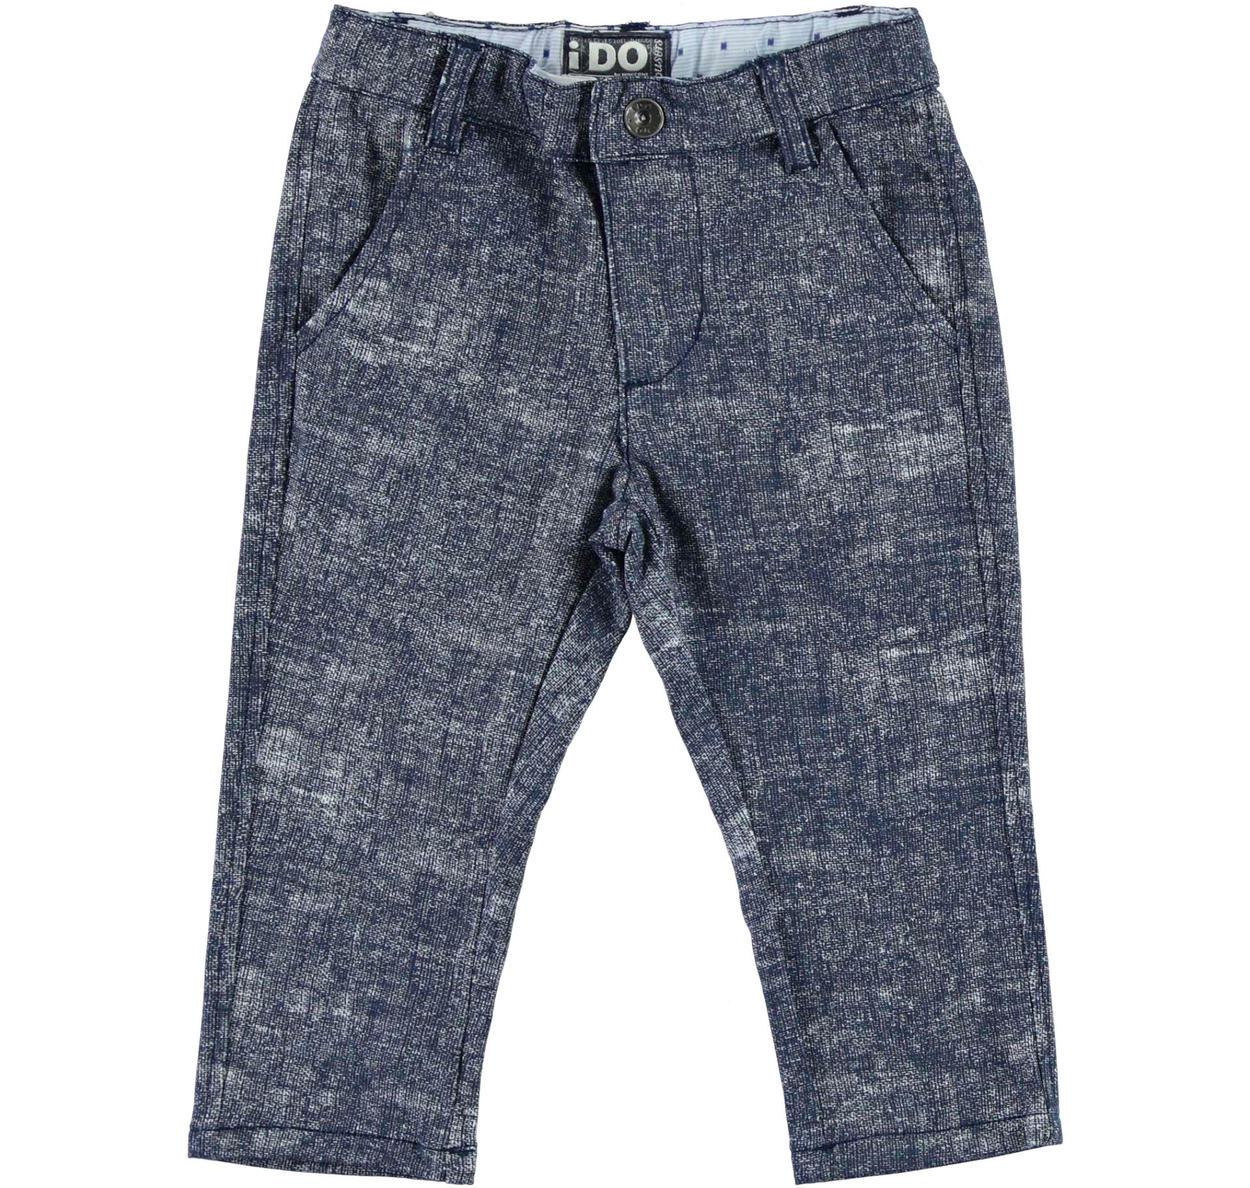 59d219bcc0a17d ... per bambino da 6 mesi a 7 anni iDO. Pantalone in felpa stretch effetto  melange ido BIANCO-BEIGE-6AR5; Pantalone in felpa stretch effetto melange  ido ...